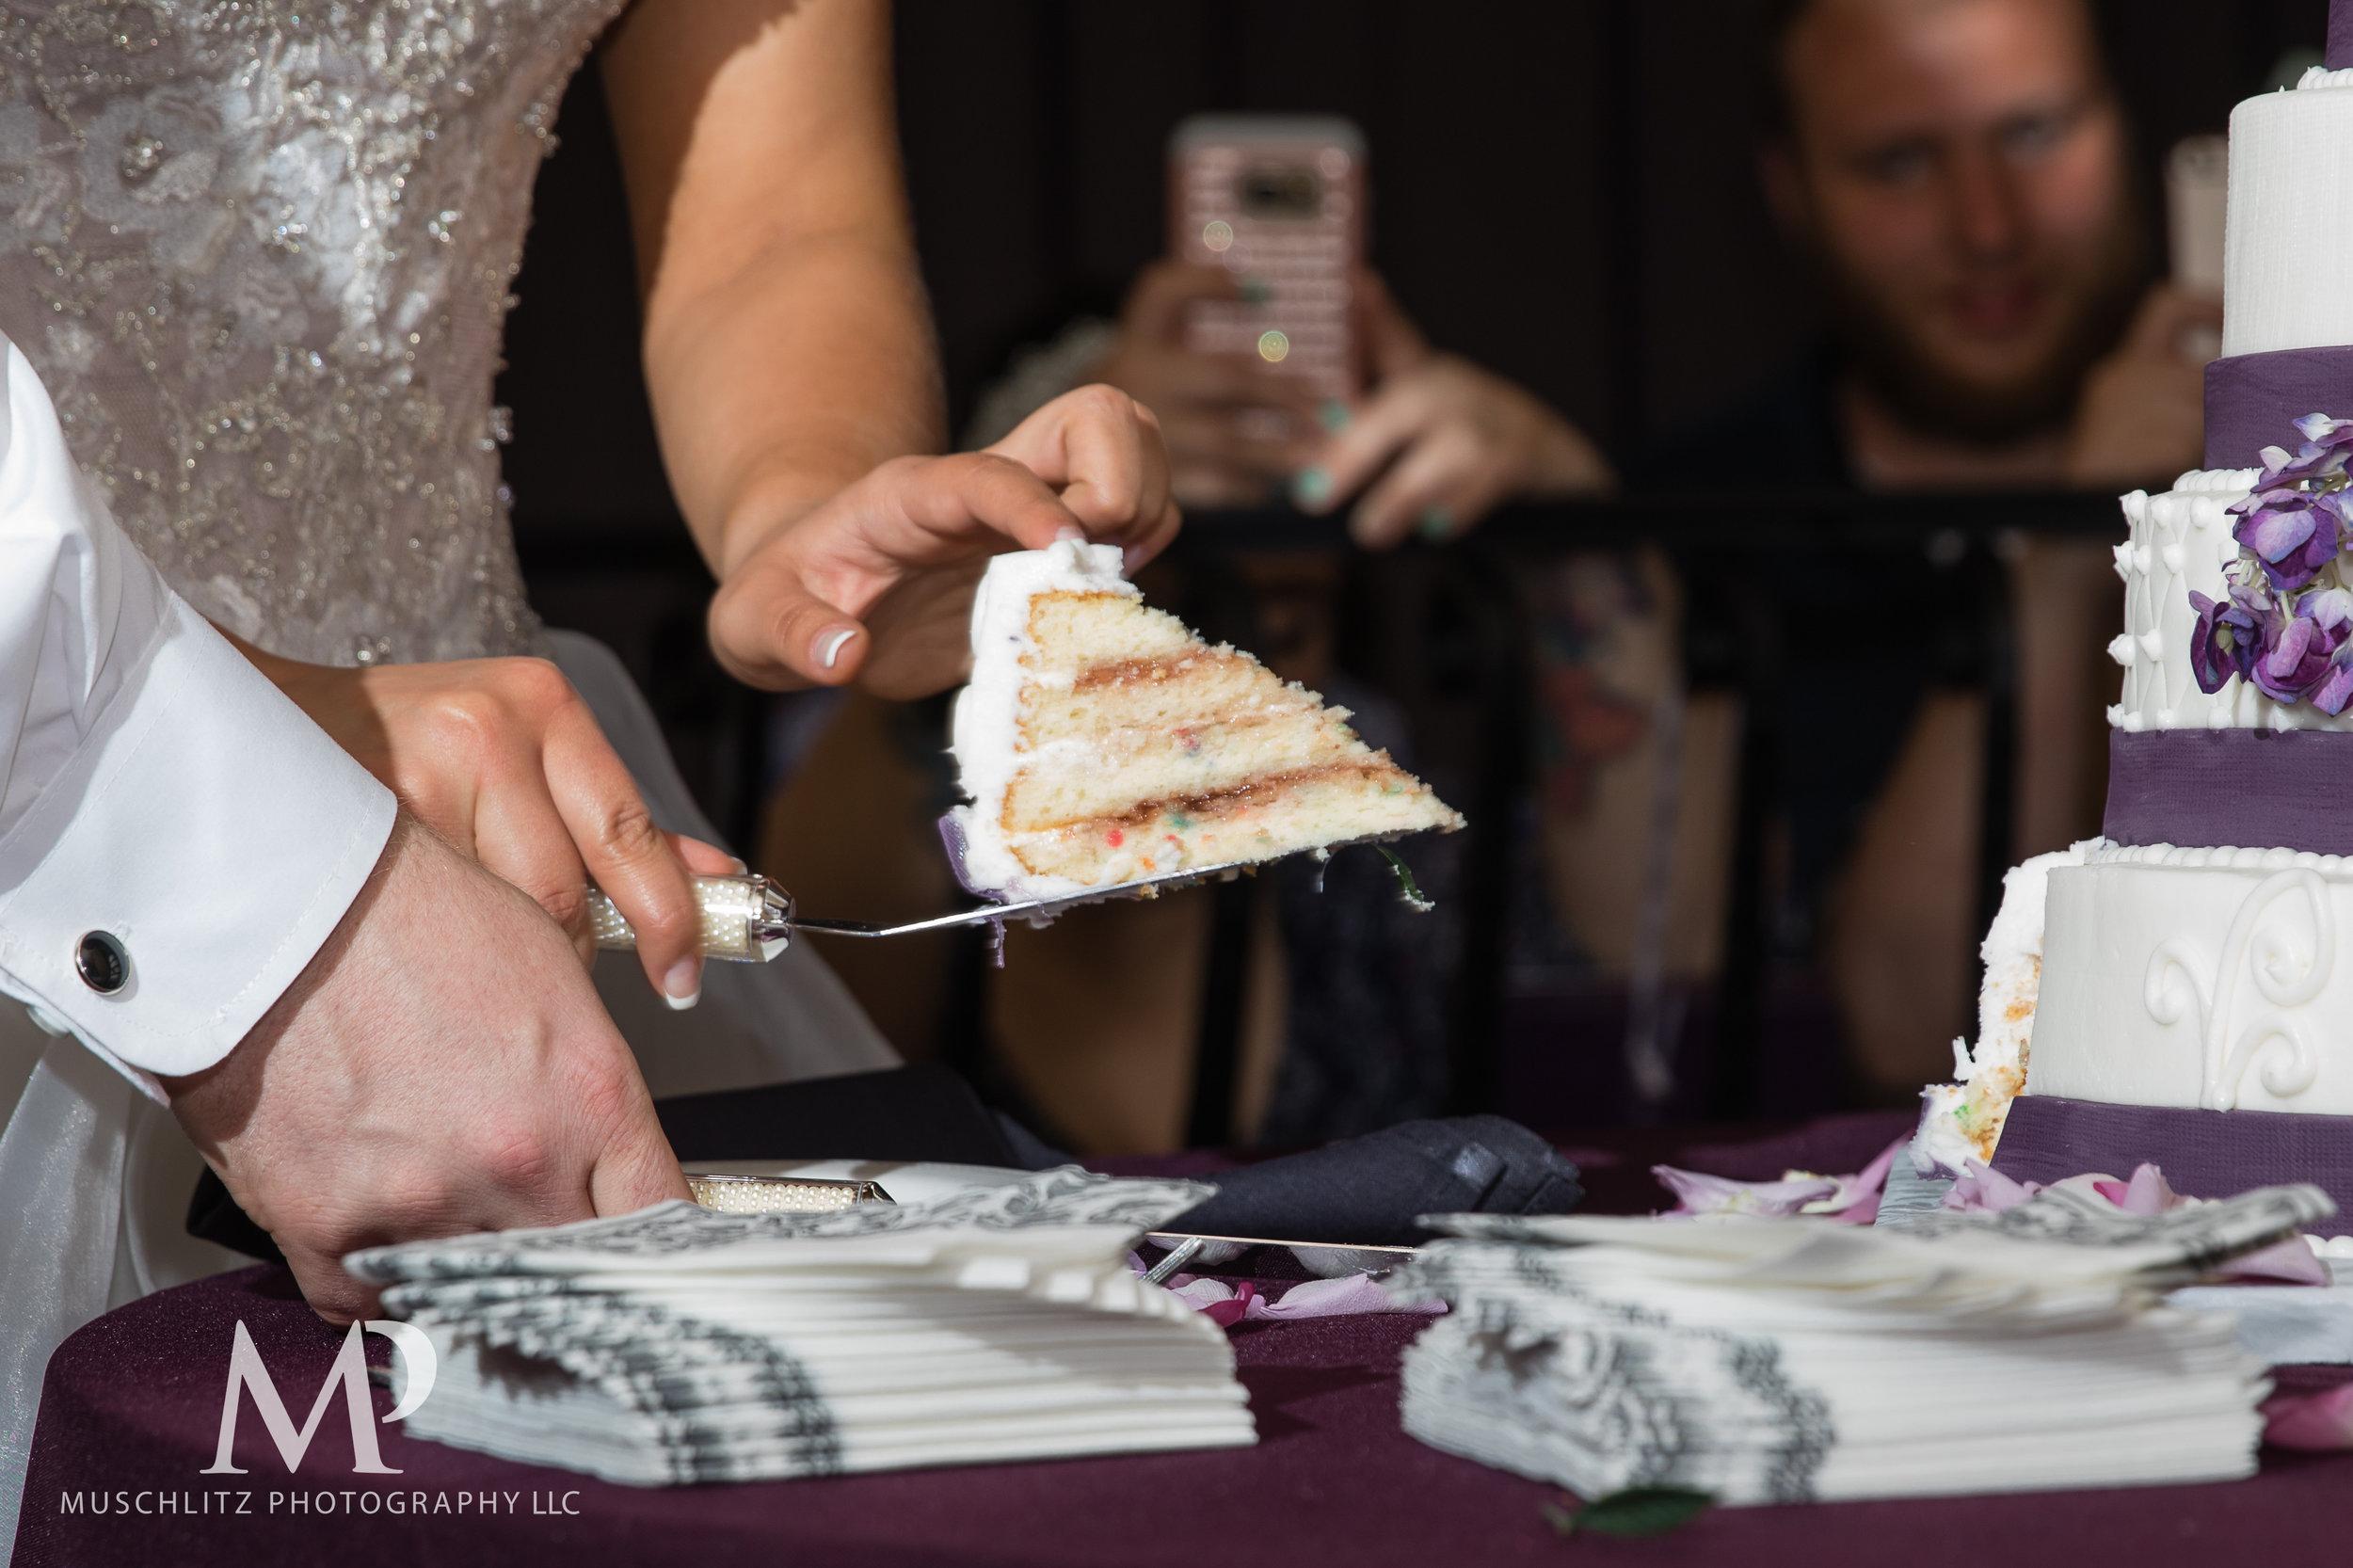 club-at-corazon-wedding-ceremony-reception-columbus-dublin-ohio-ohio-university-theme-079.JPG